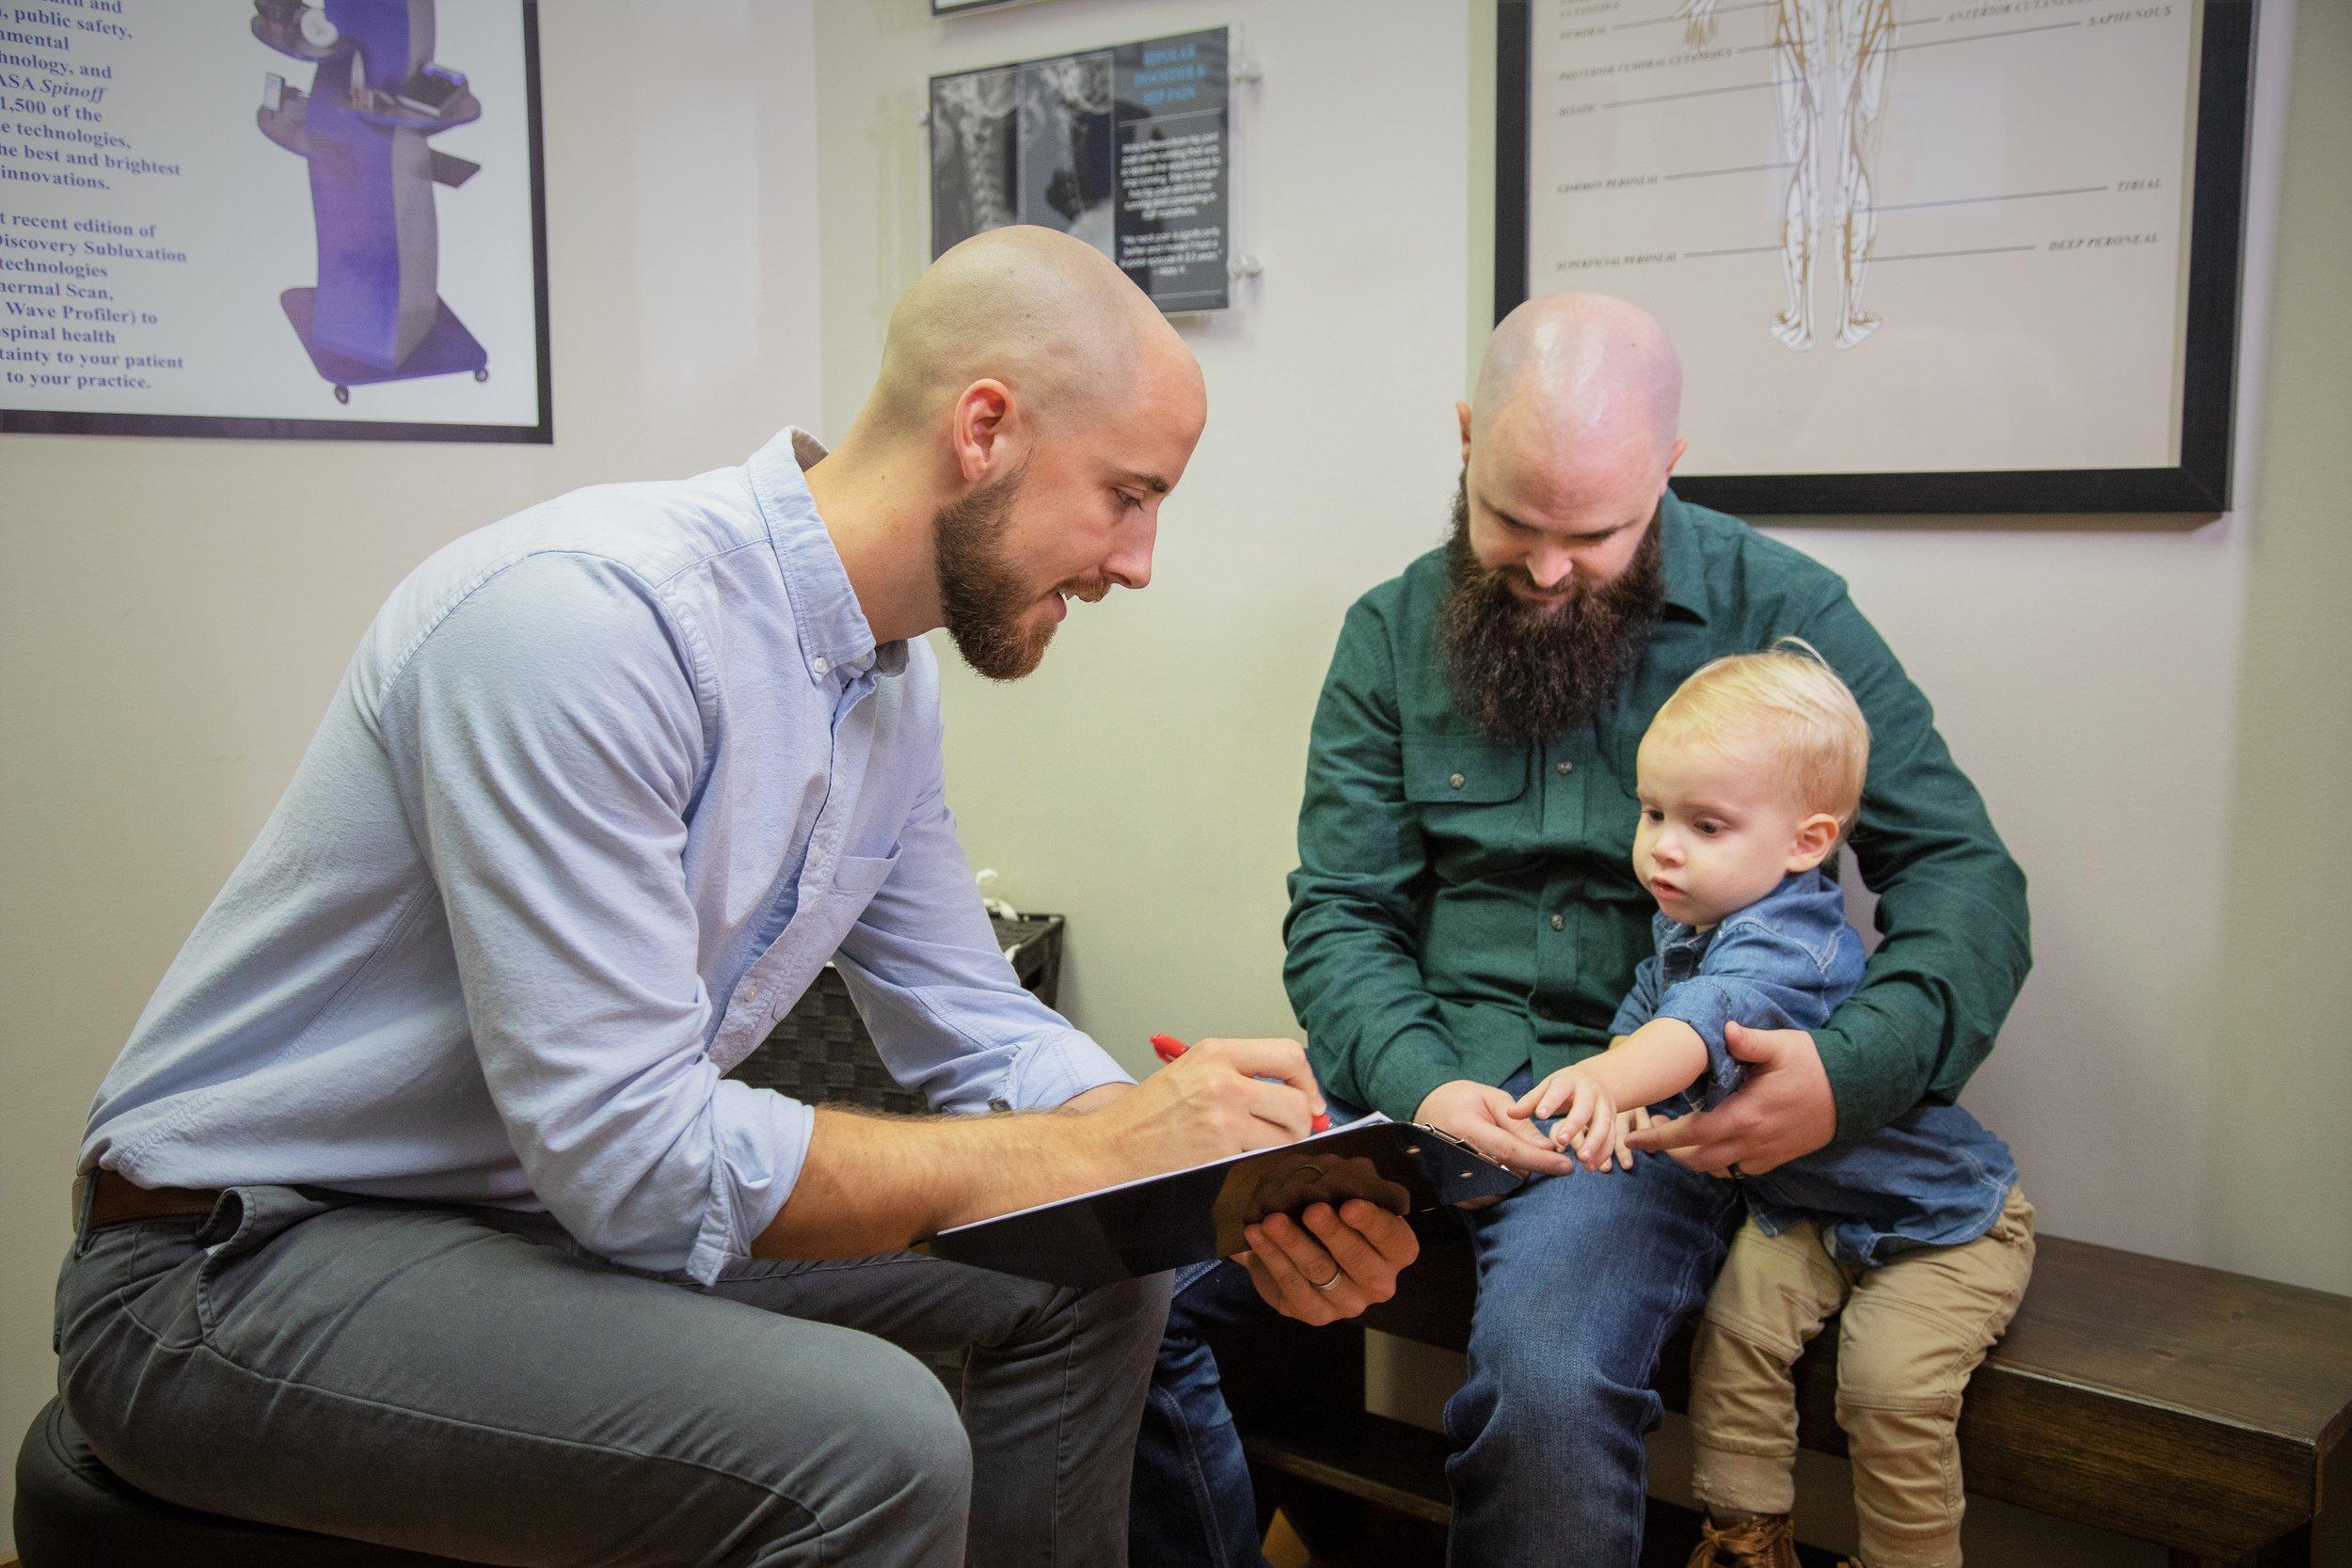 Restoration-Family-Chiropractic-consultation-health-history.JPG